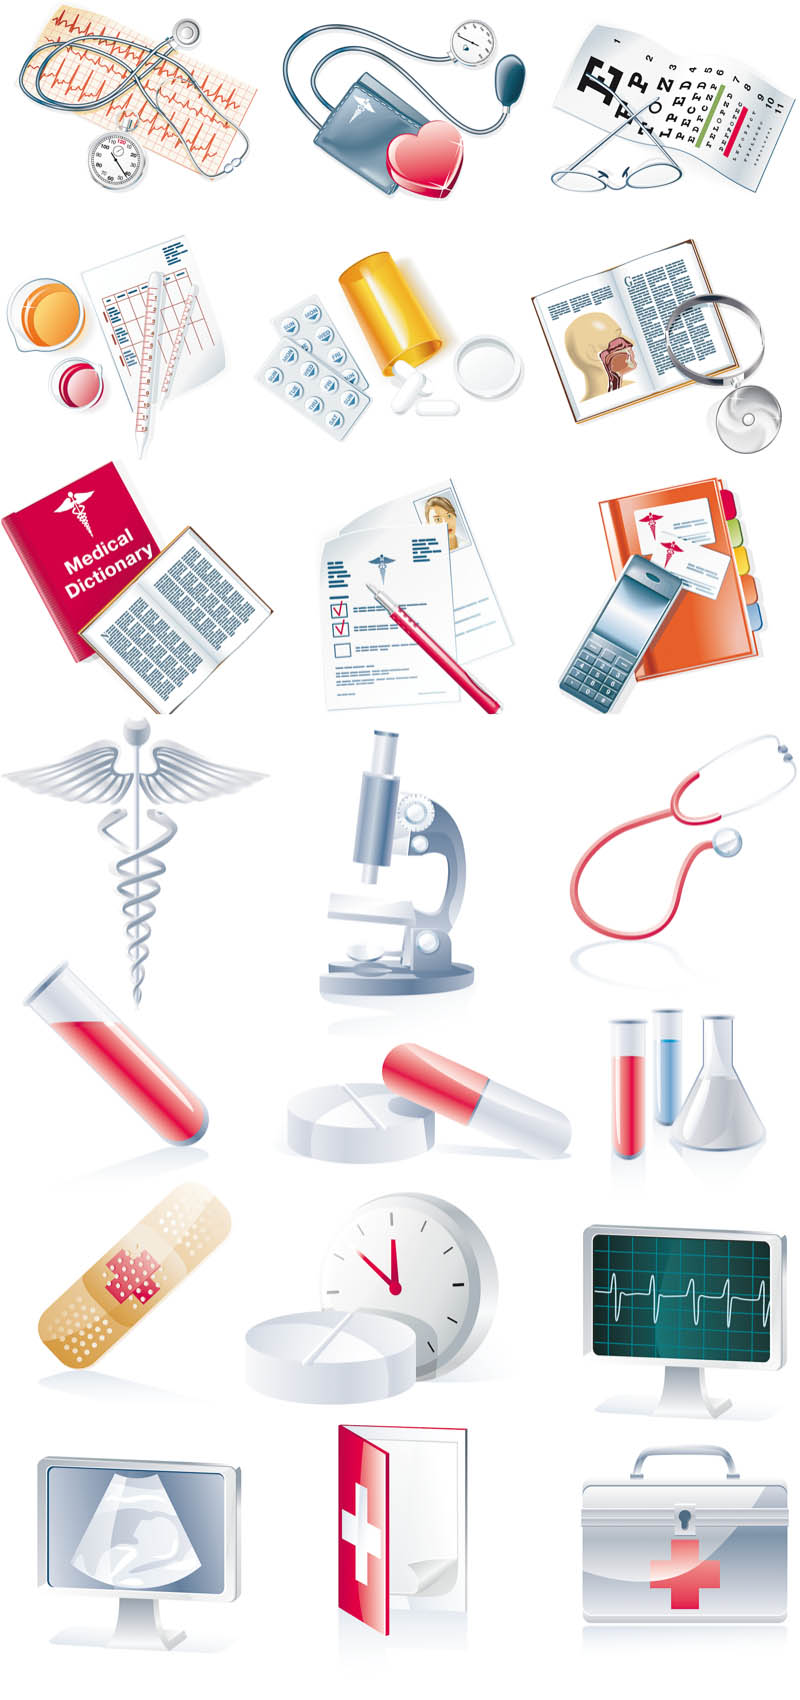 medical clip art free downloads